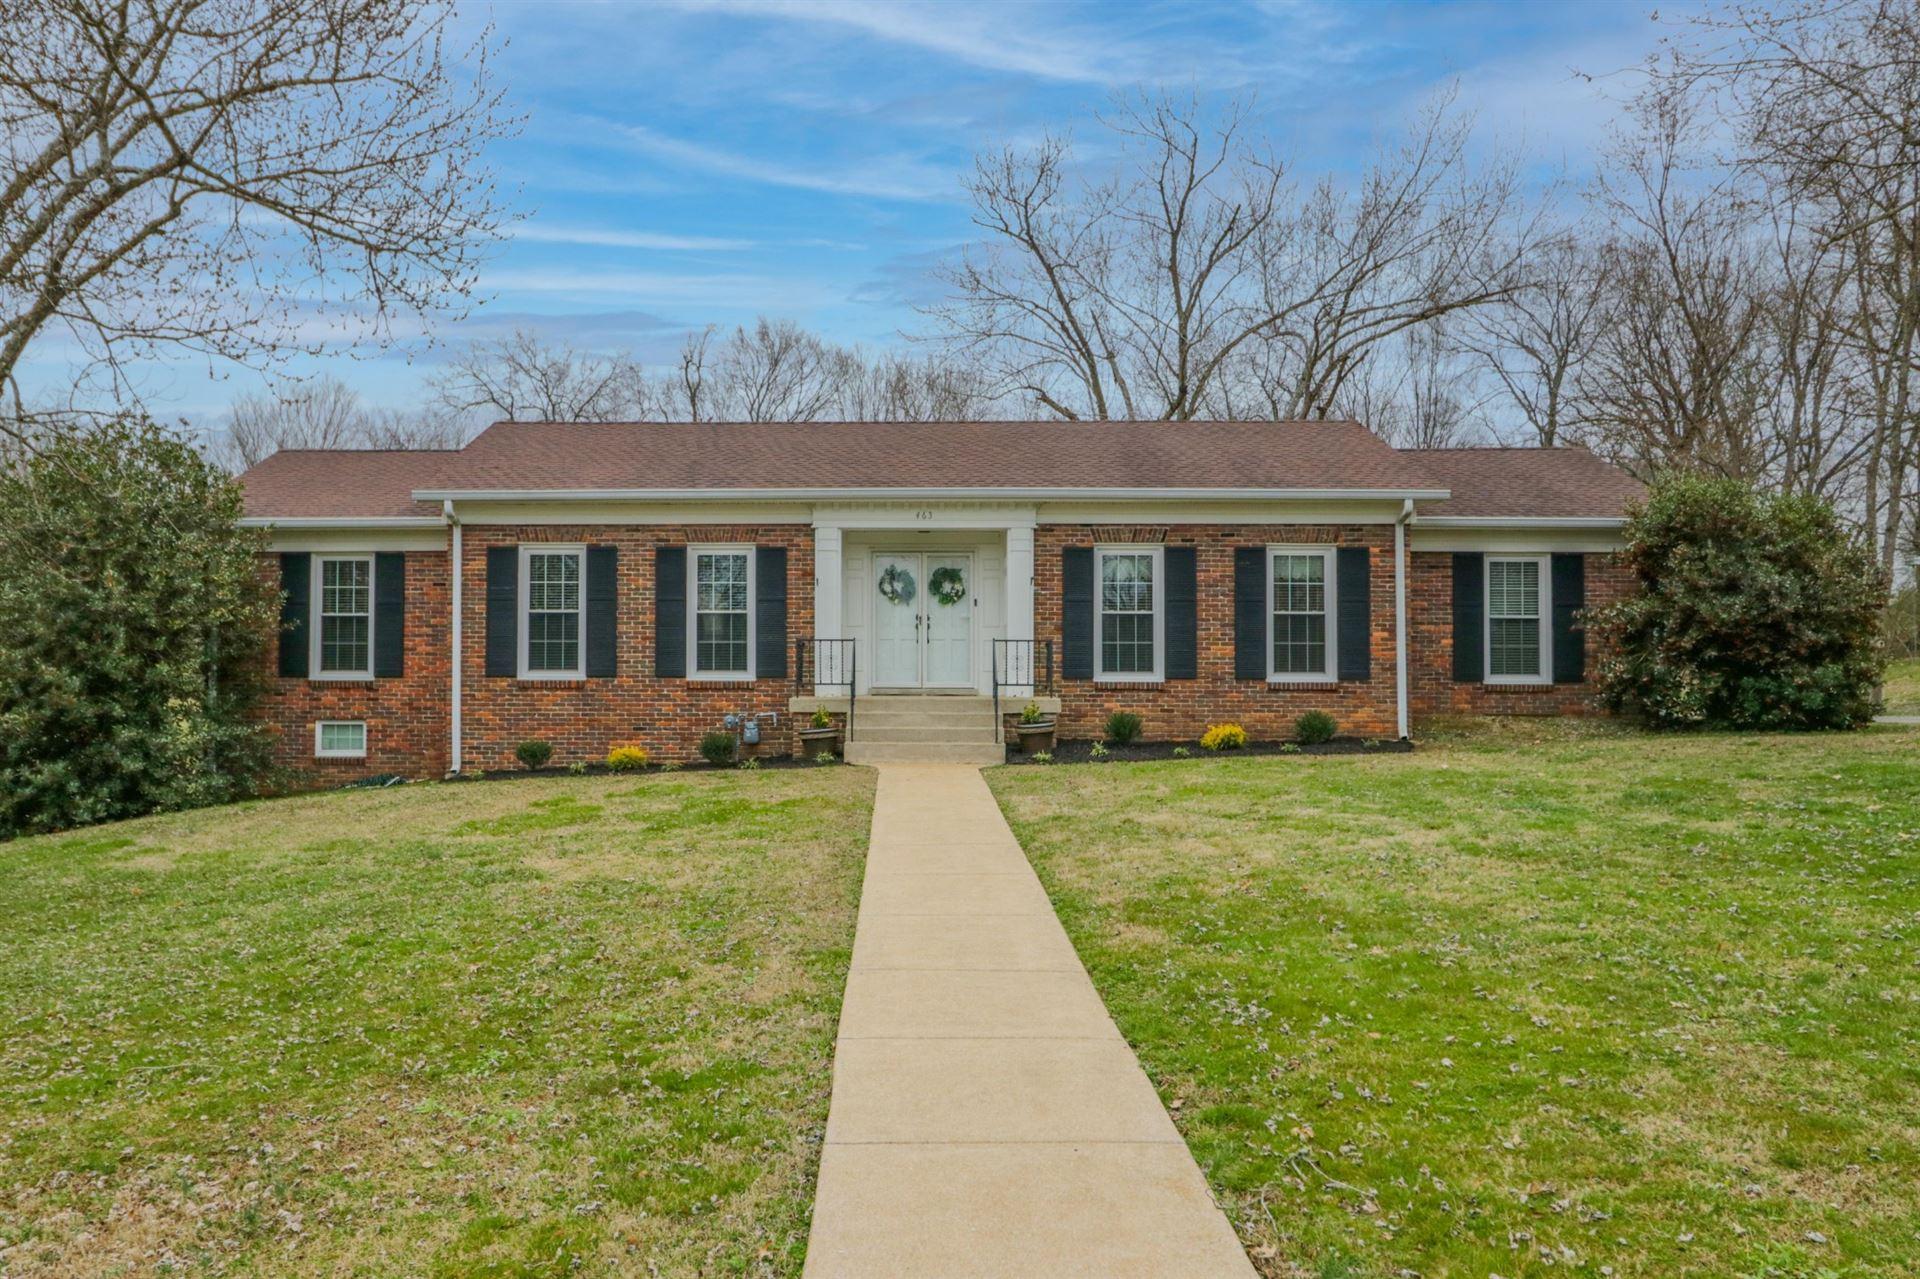 463 Manor Cir, Lewisburg, TN 37091 - MLS#: 2237267